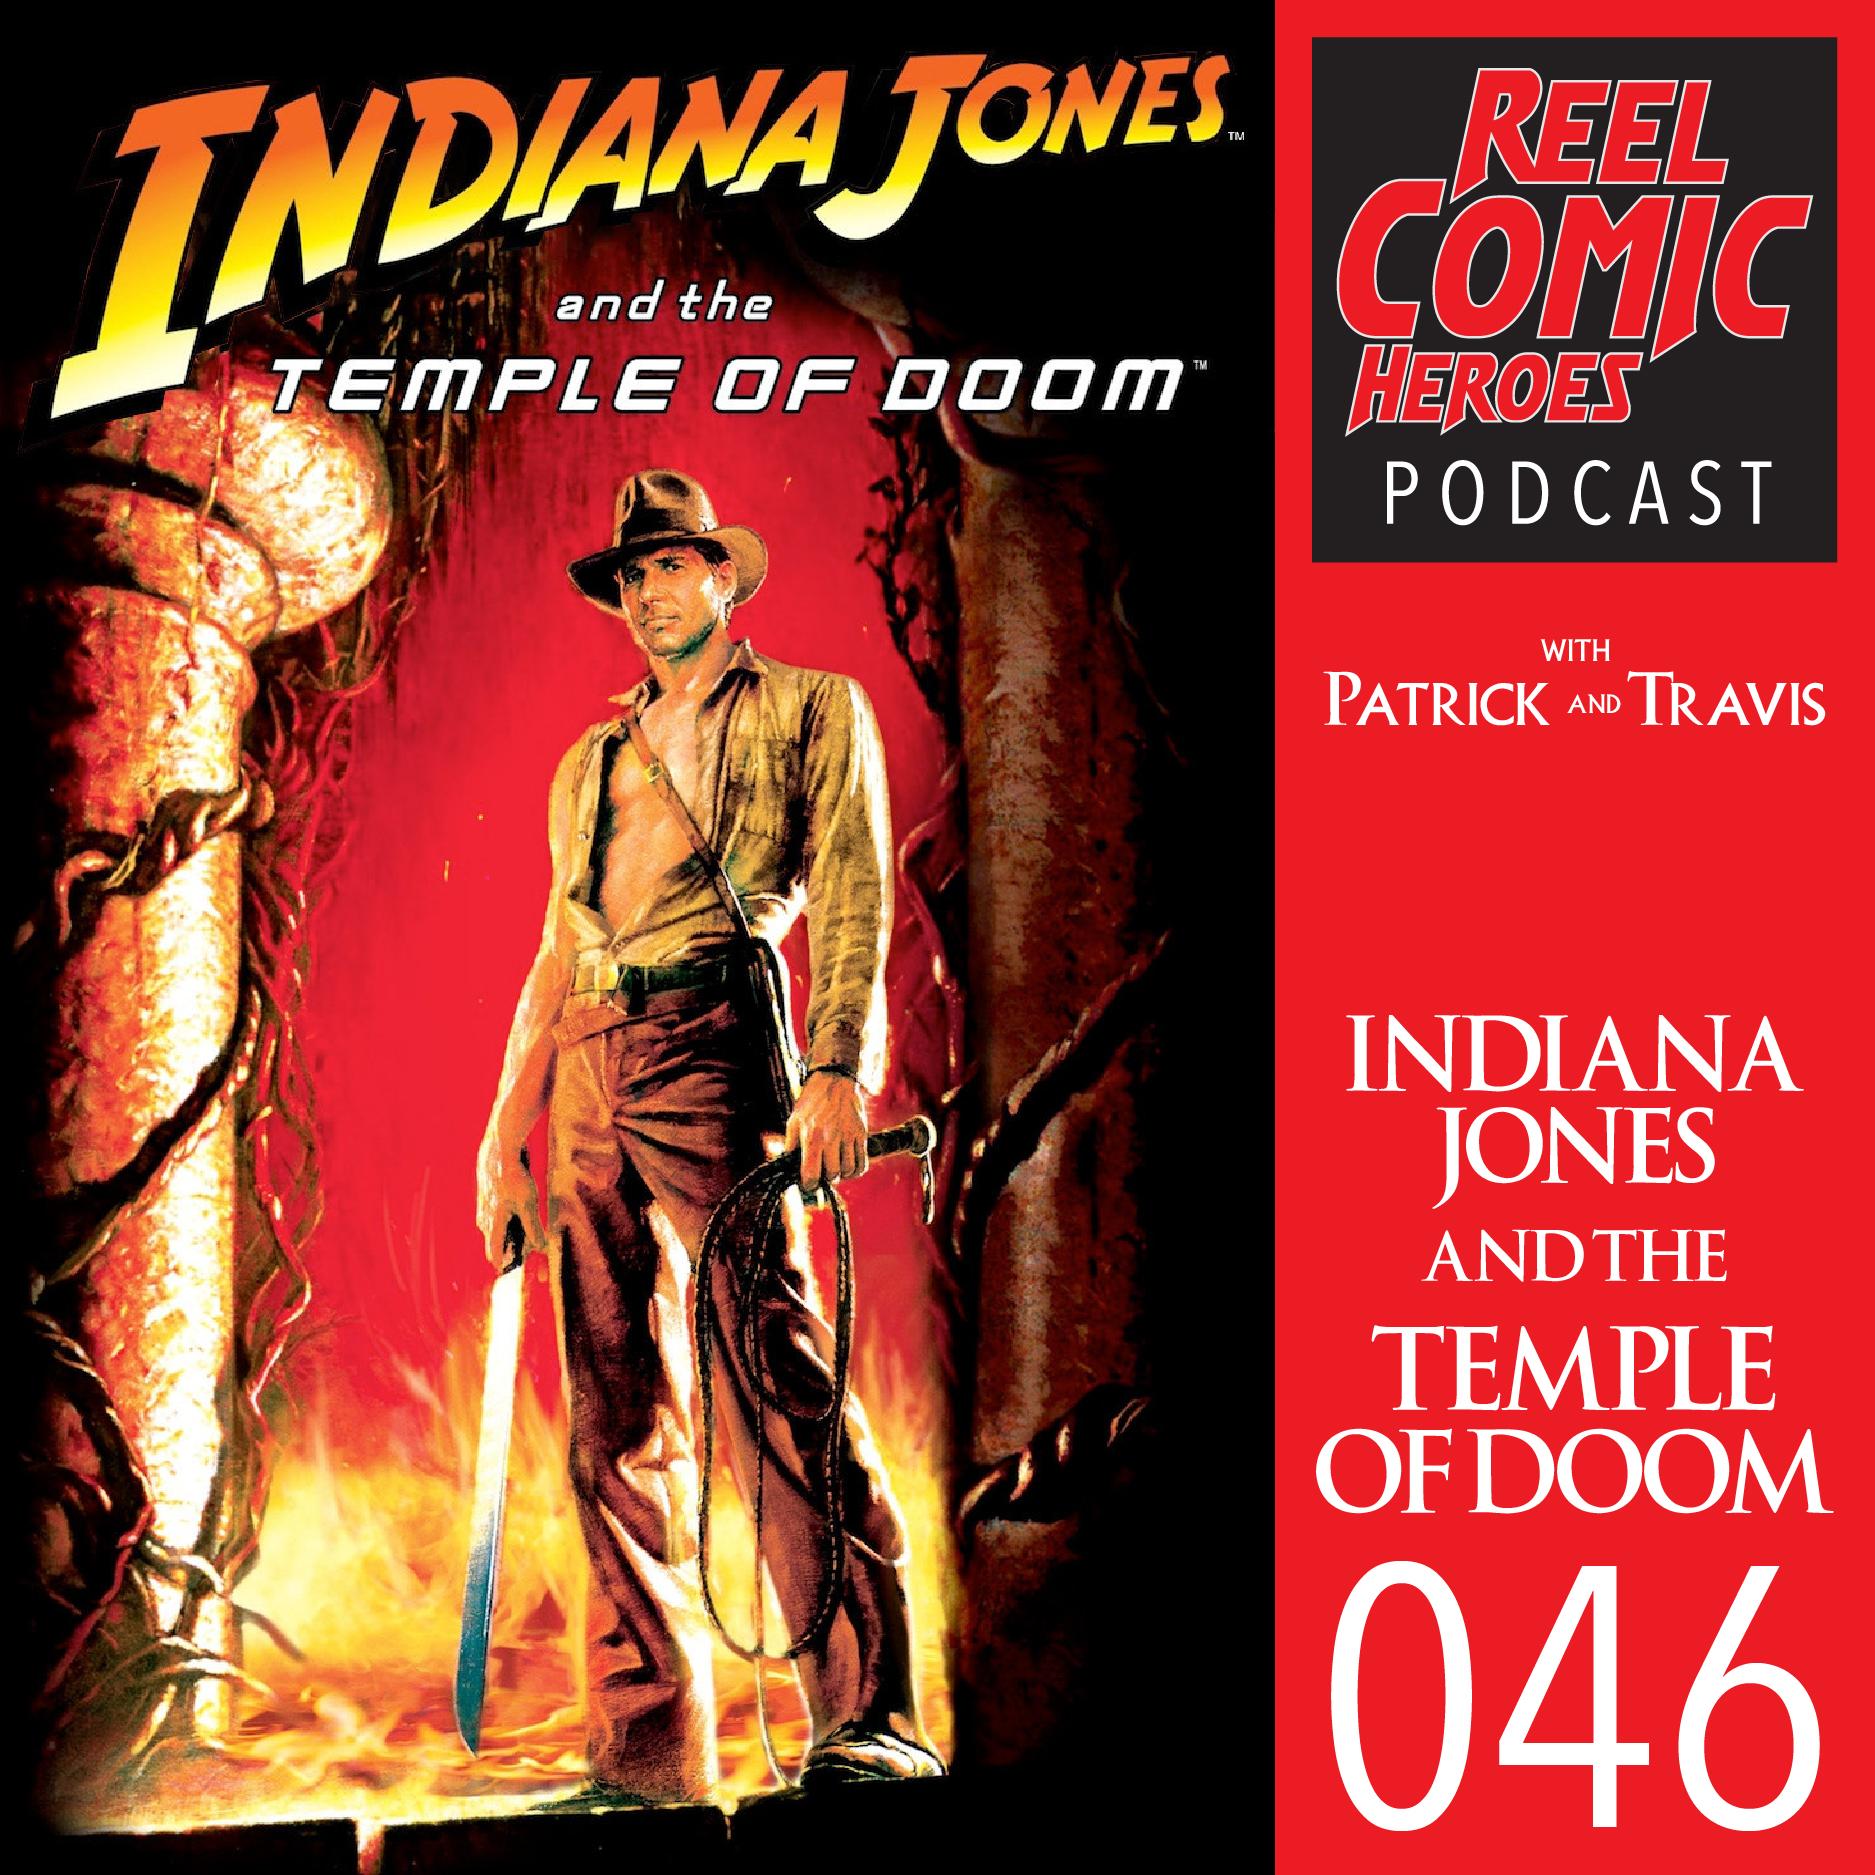 Artwork for Reel Comic Heroes 046 - Indiana Jones and the Temple of Doom